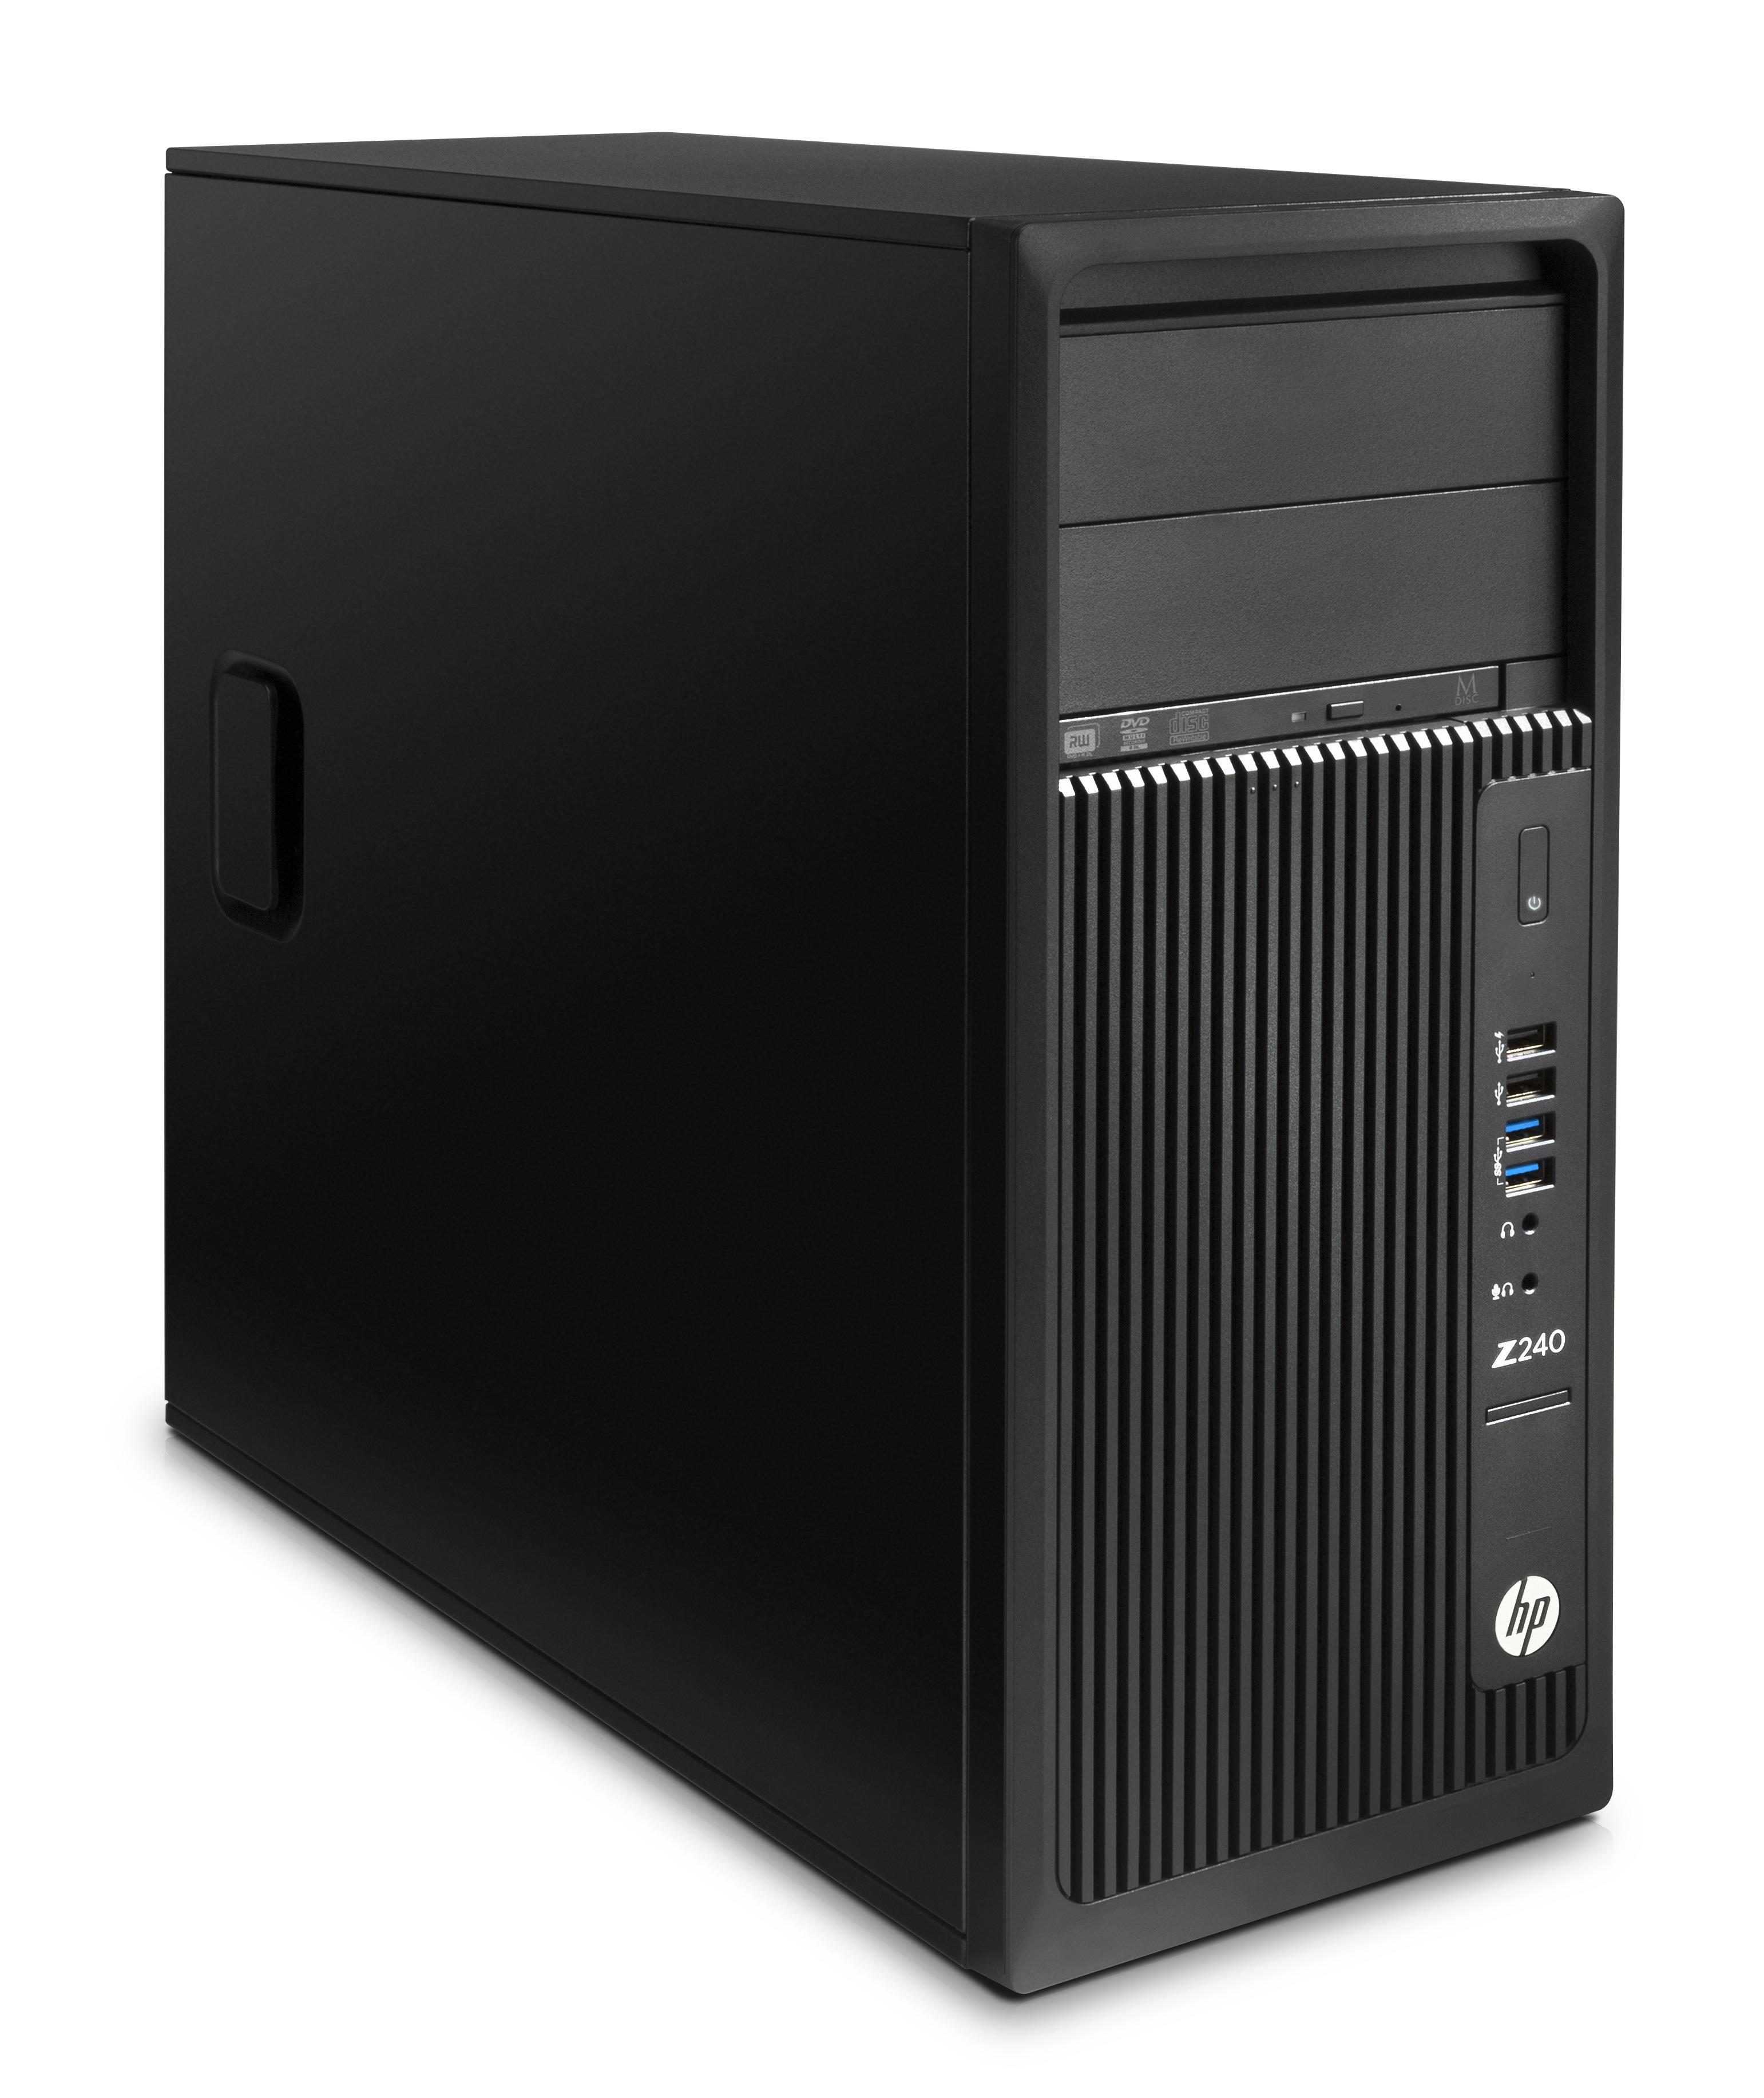 HP Workstation Z240 - Midi Tower